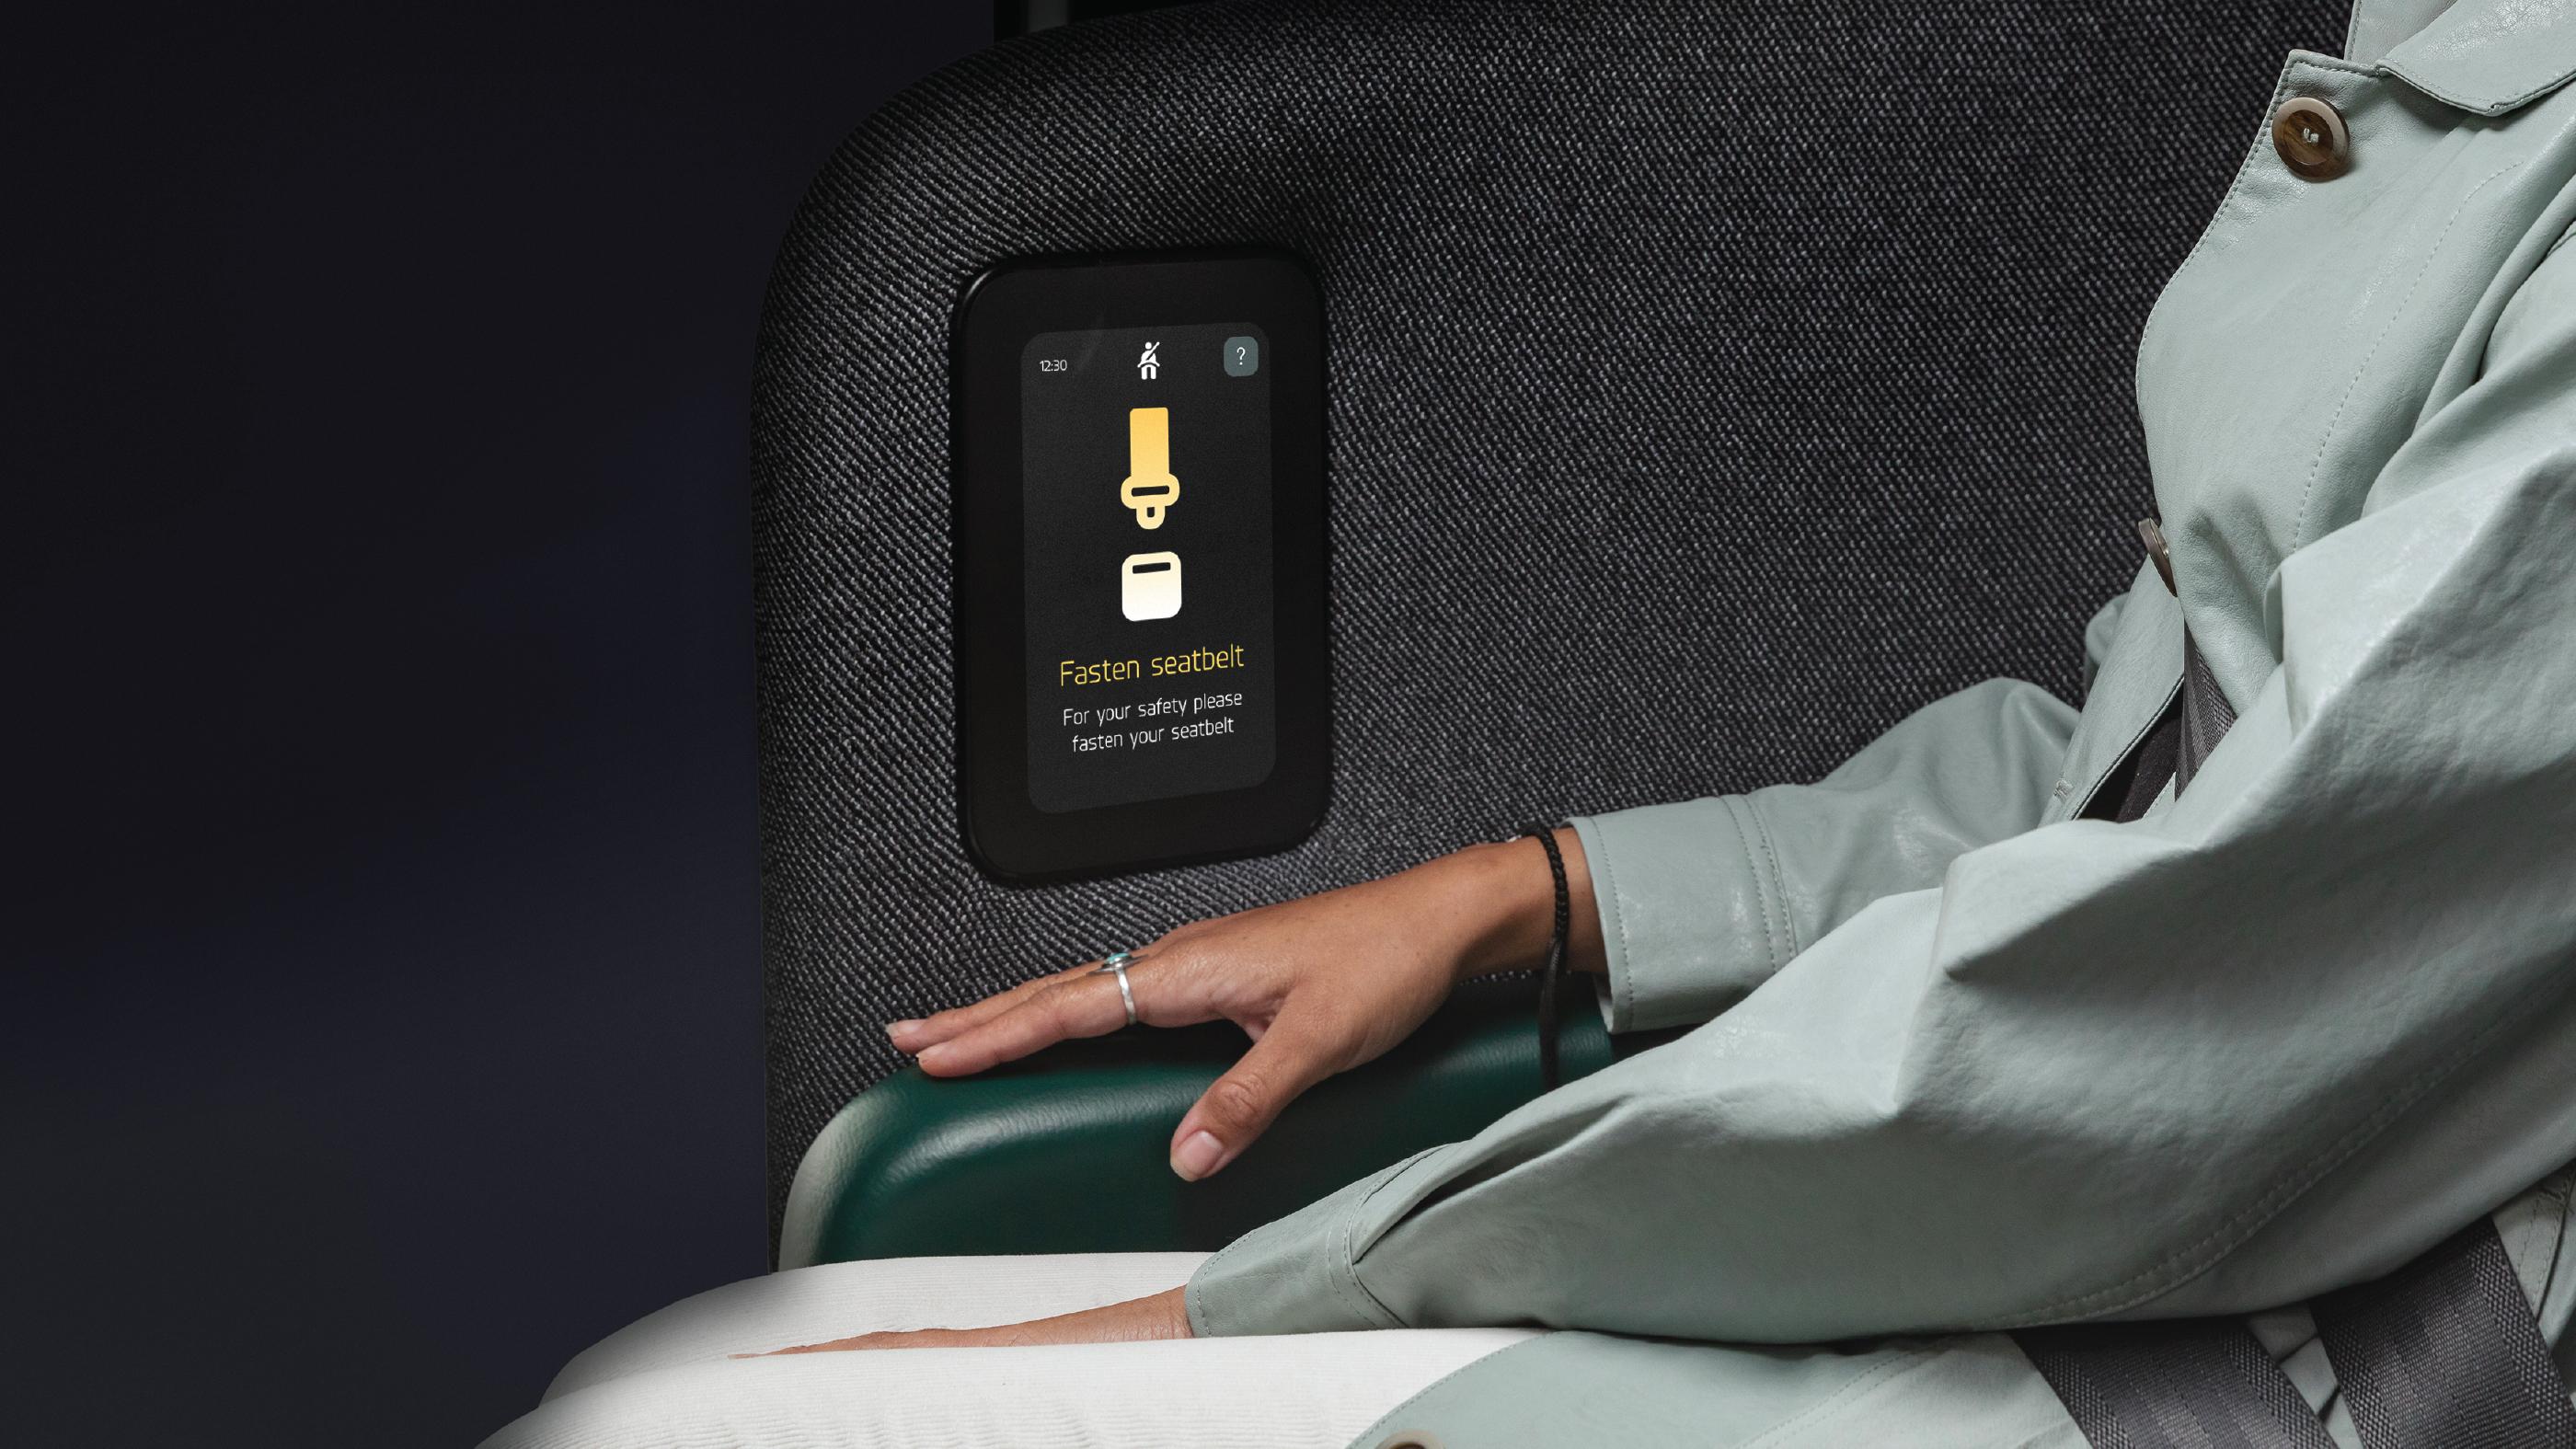 Zoox Seatbelt Notification